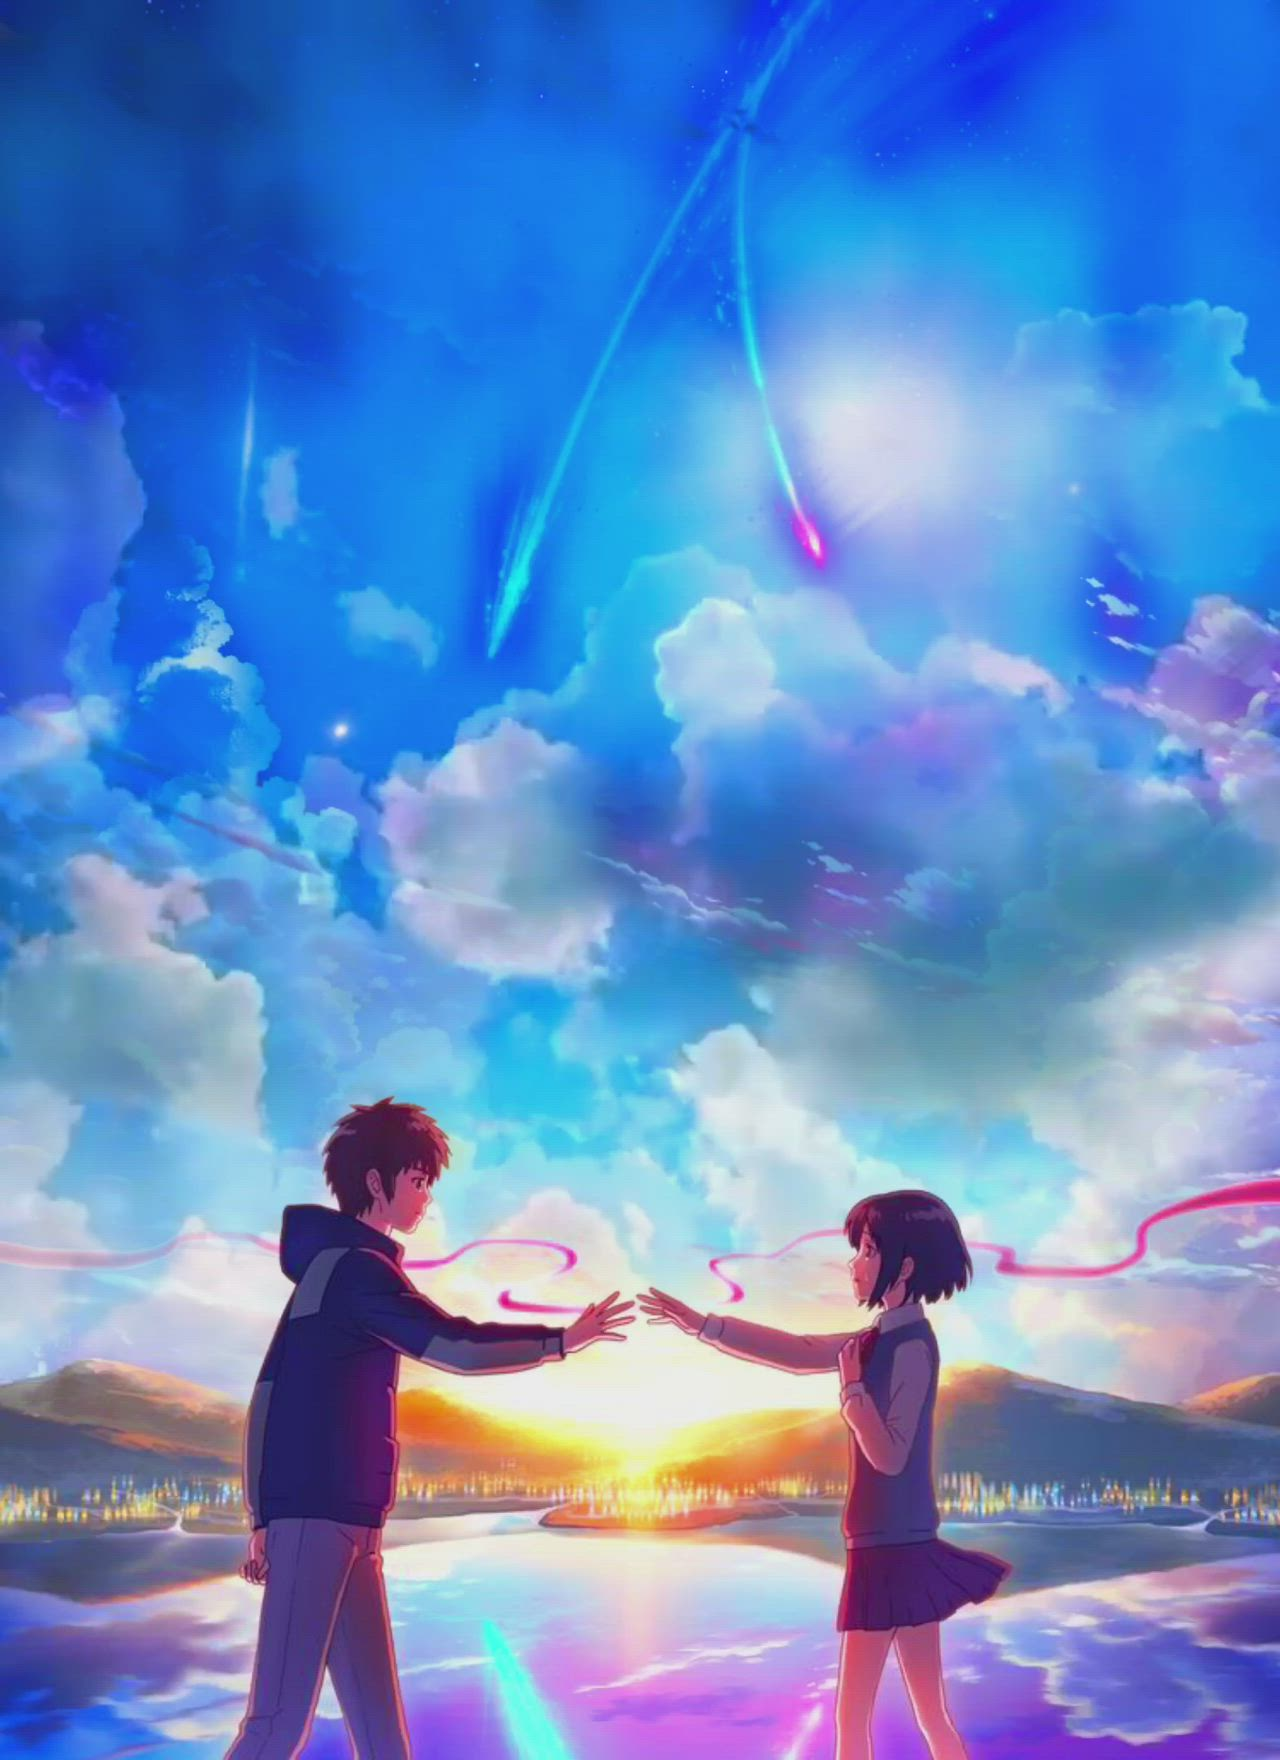 Pin On Anime Art Download yovoy anime live wallpaper